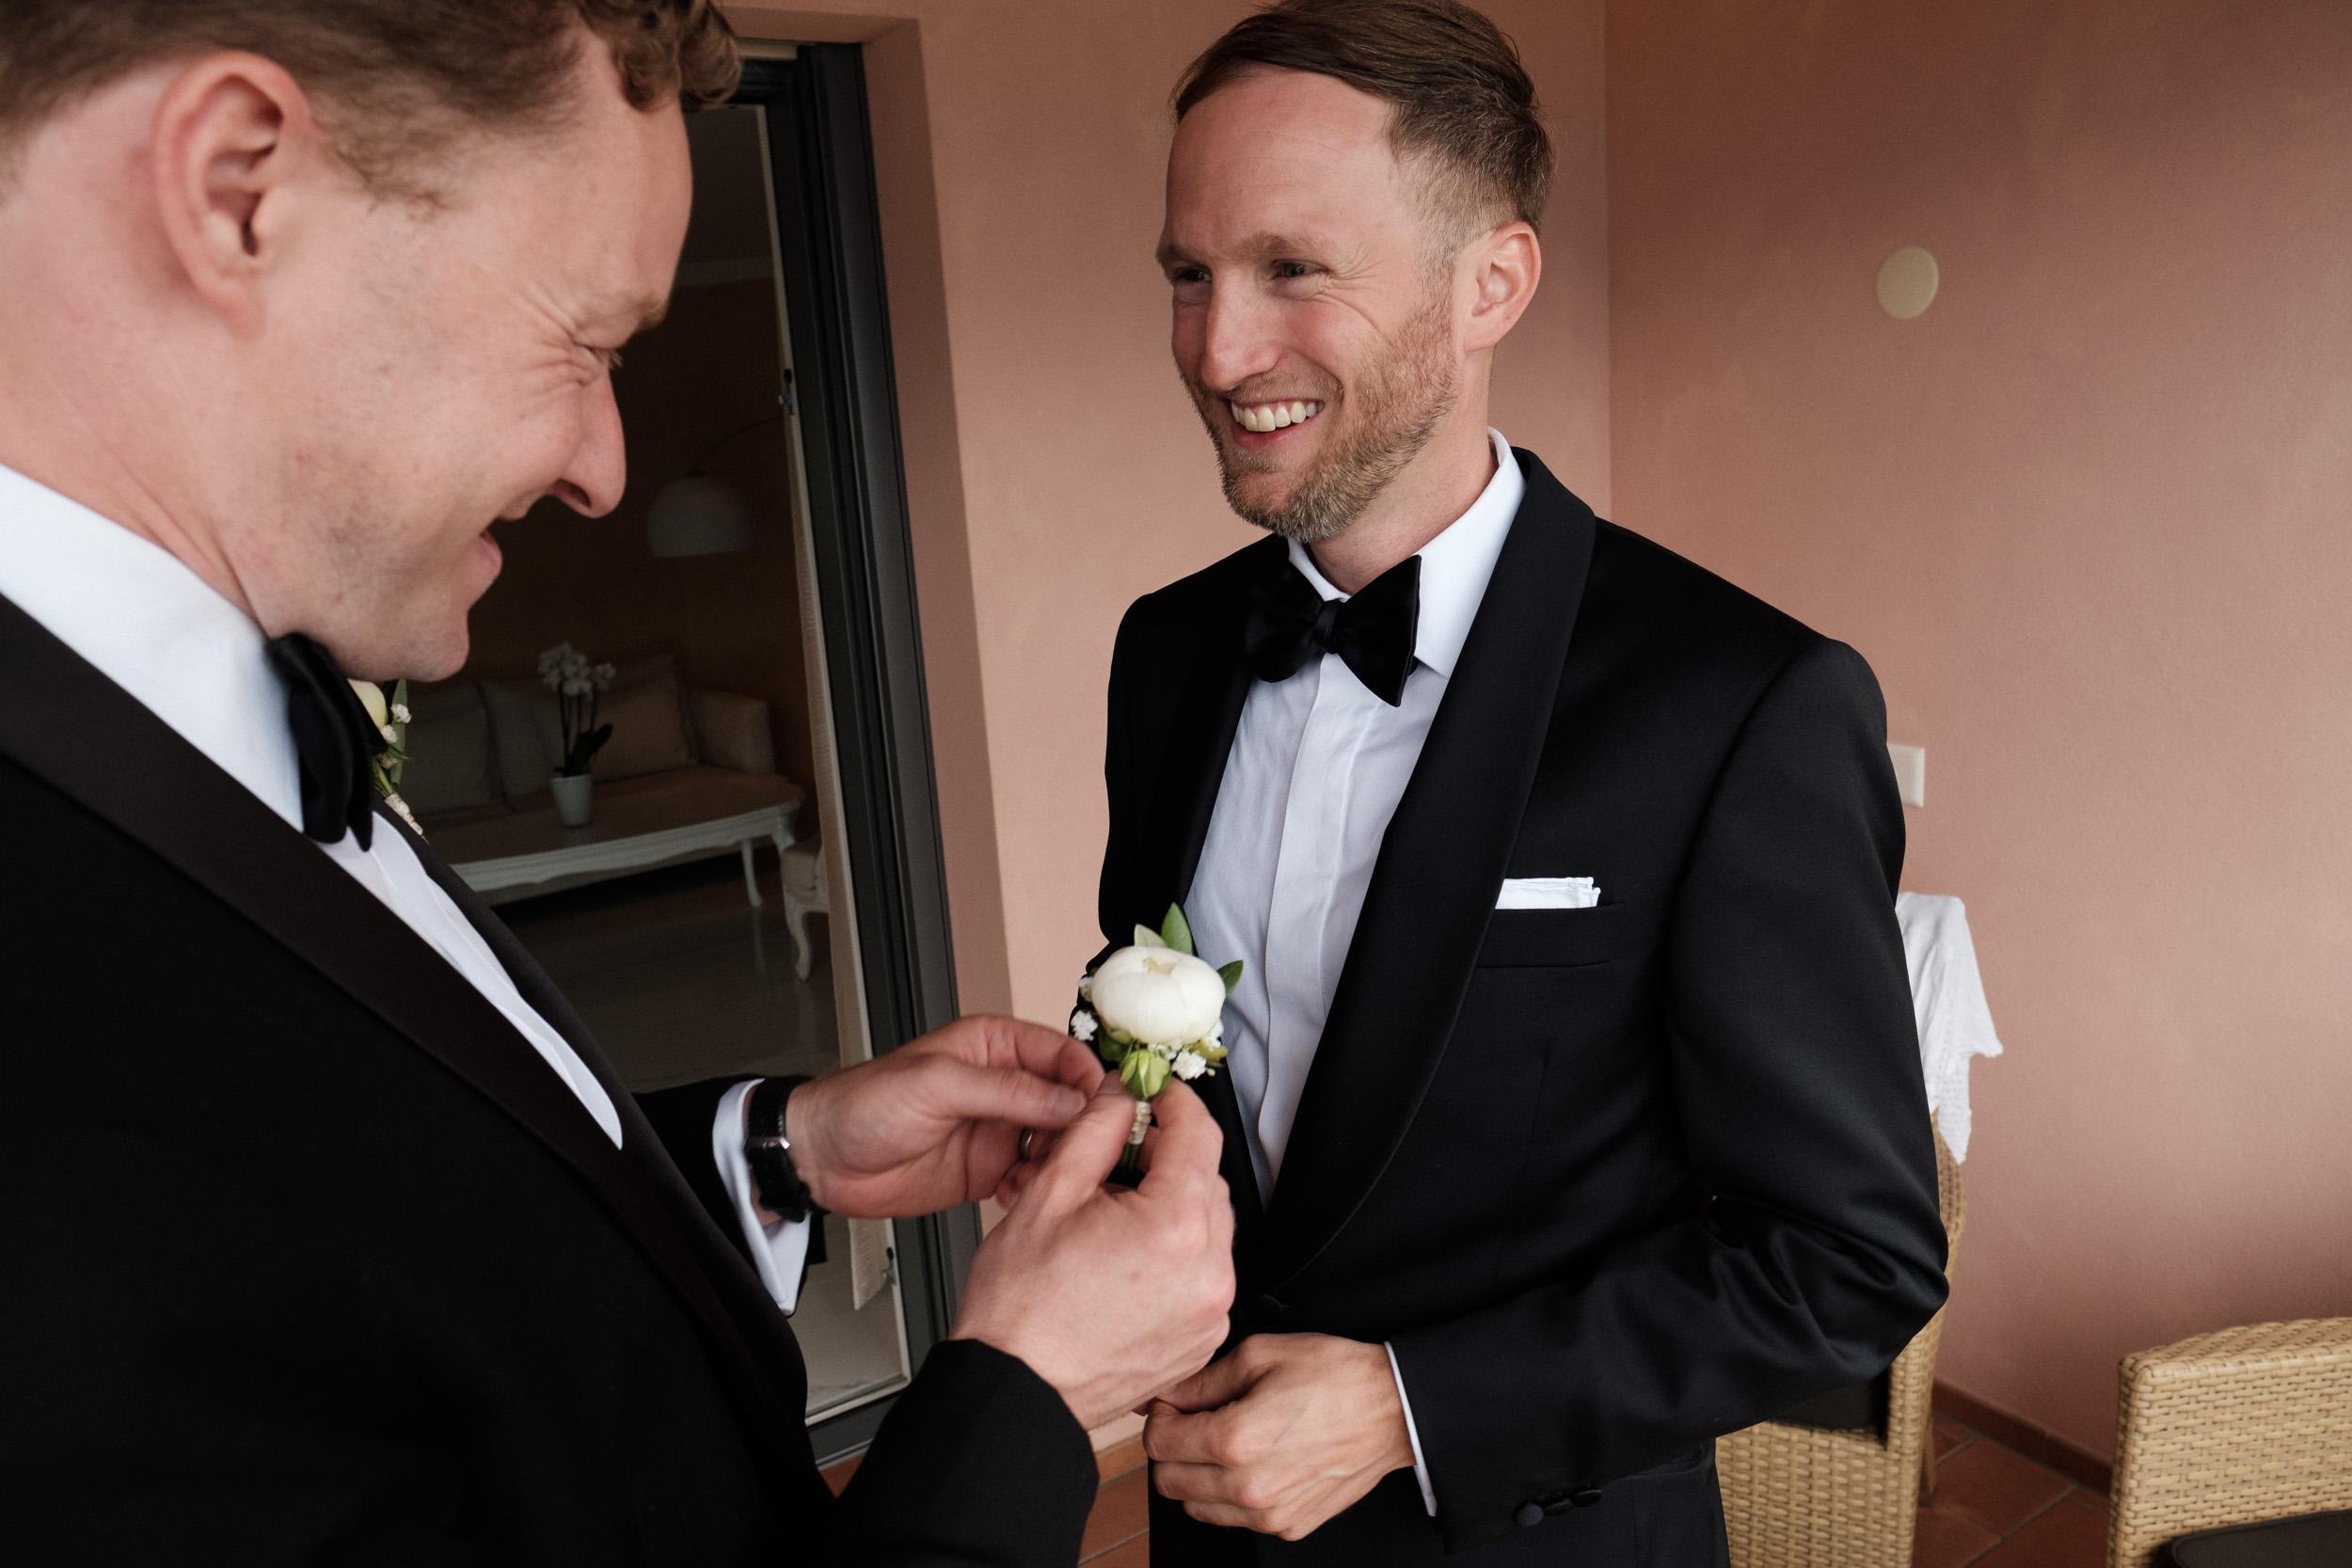 olivia-andreas-wedding-switzerland-69.jpg